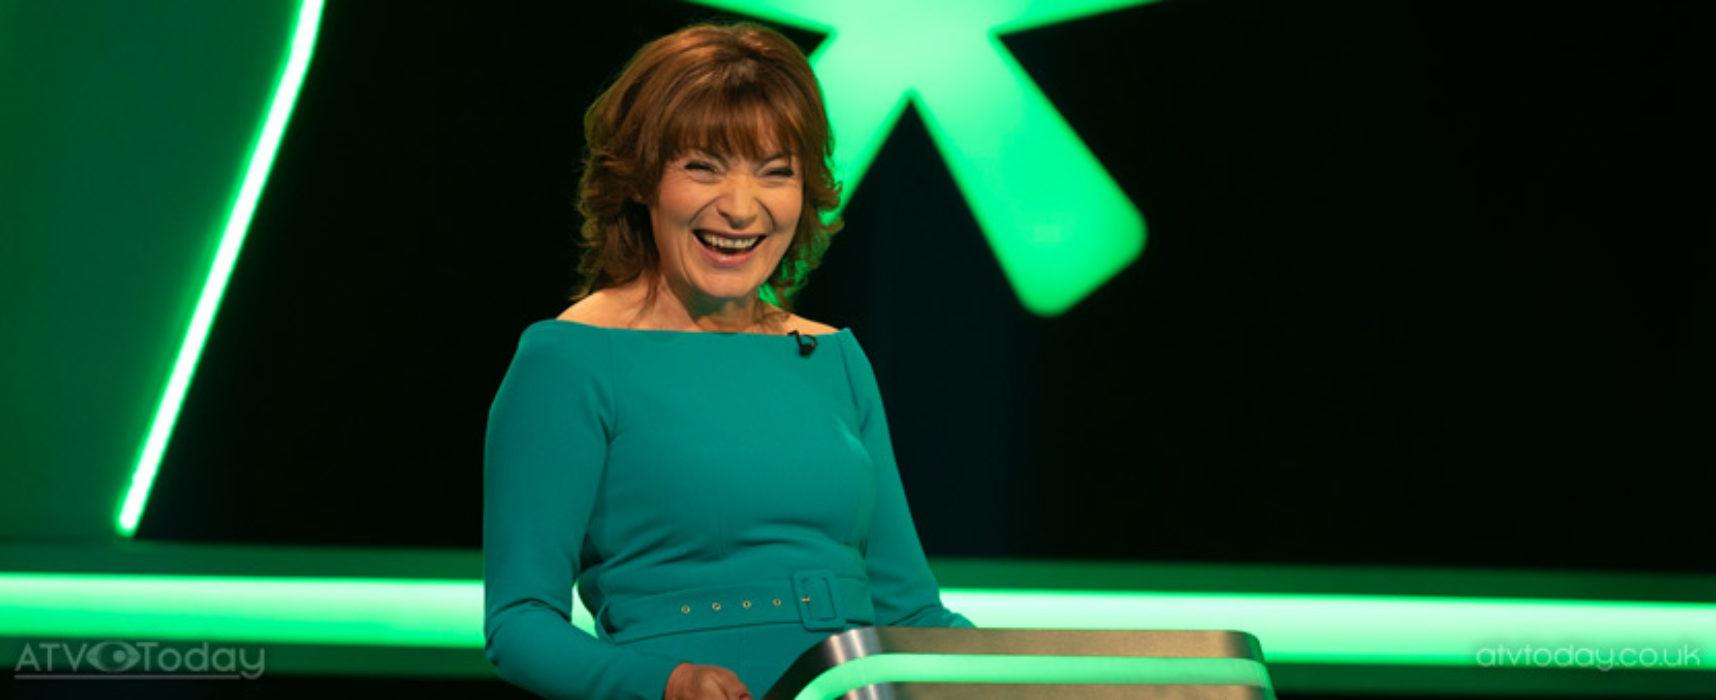 Lorraine Kelly opens STV's Cash Machine